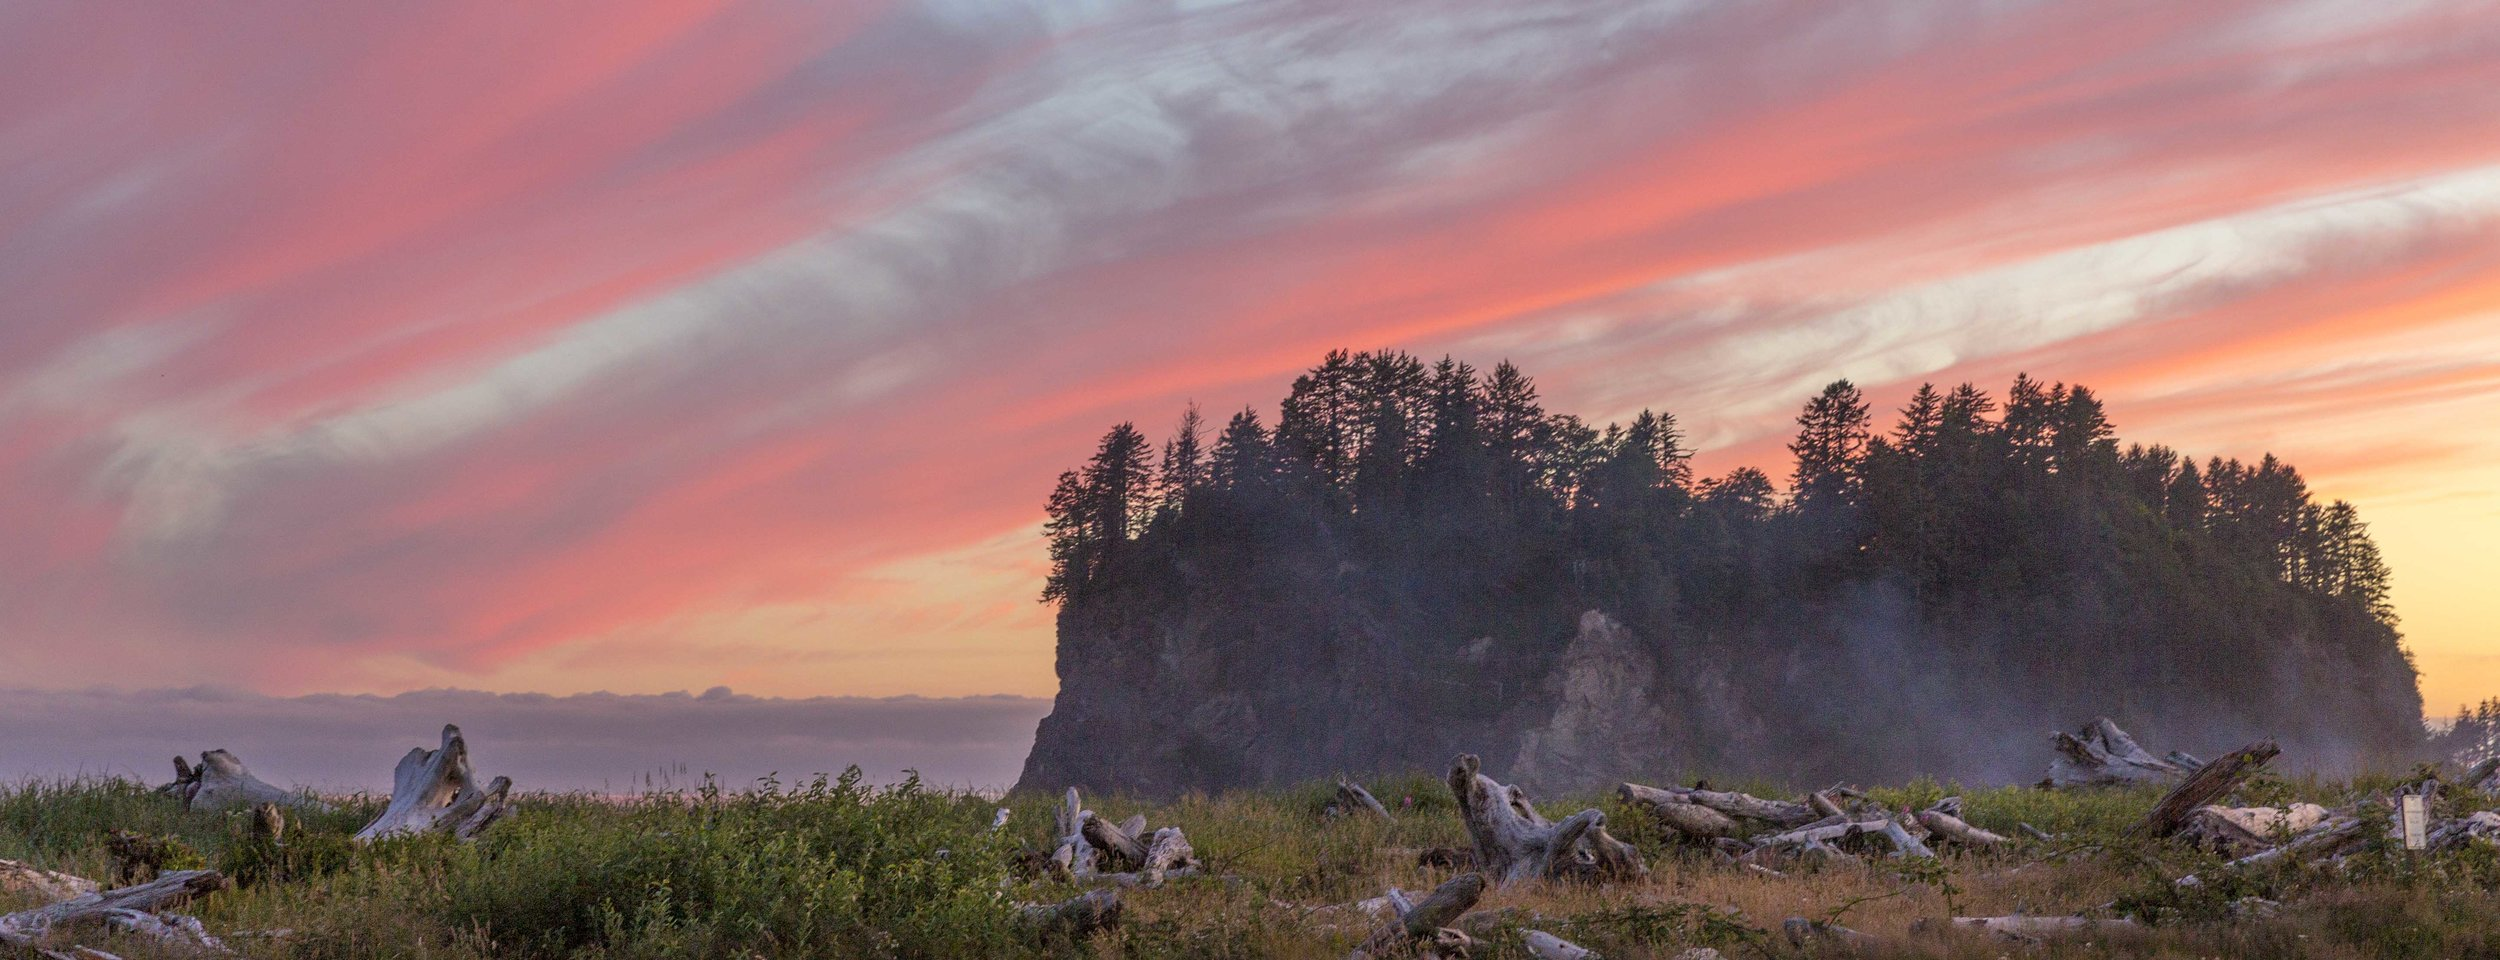 quileute_shore_sunset_banner.jpg